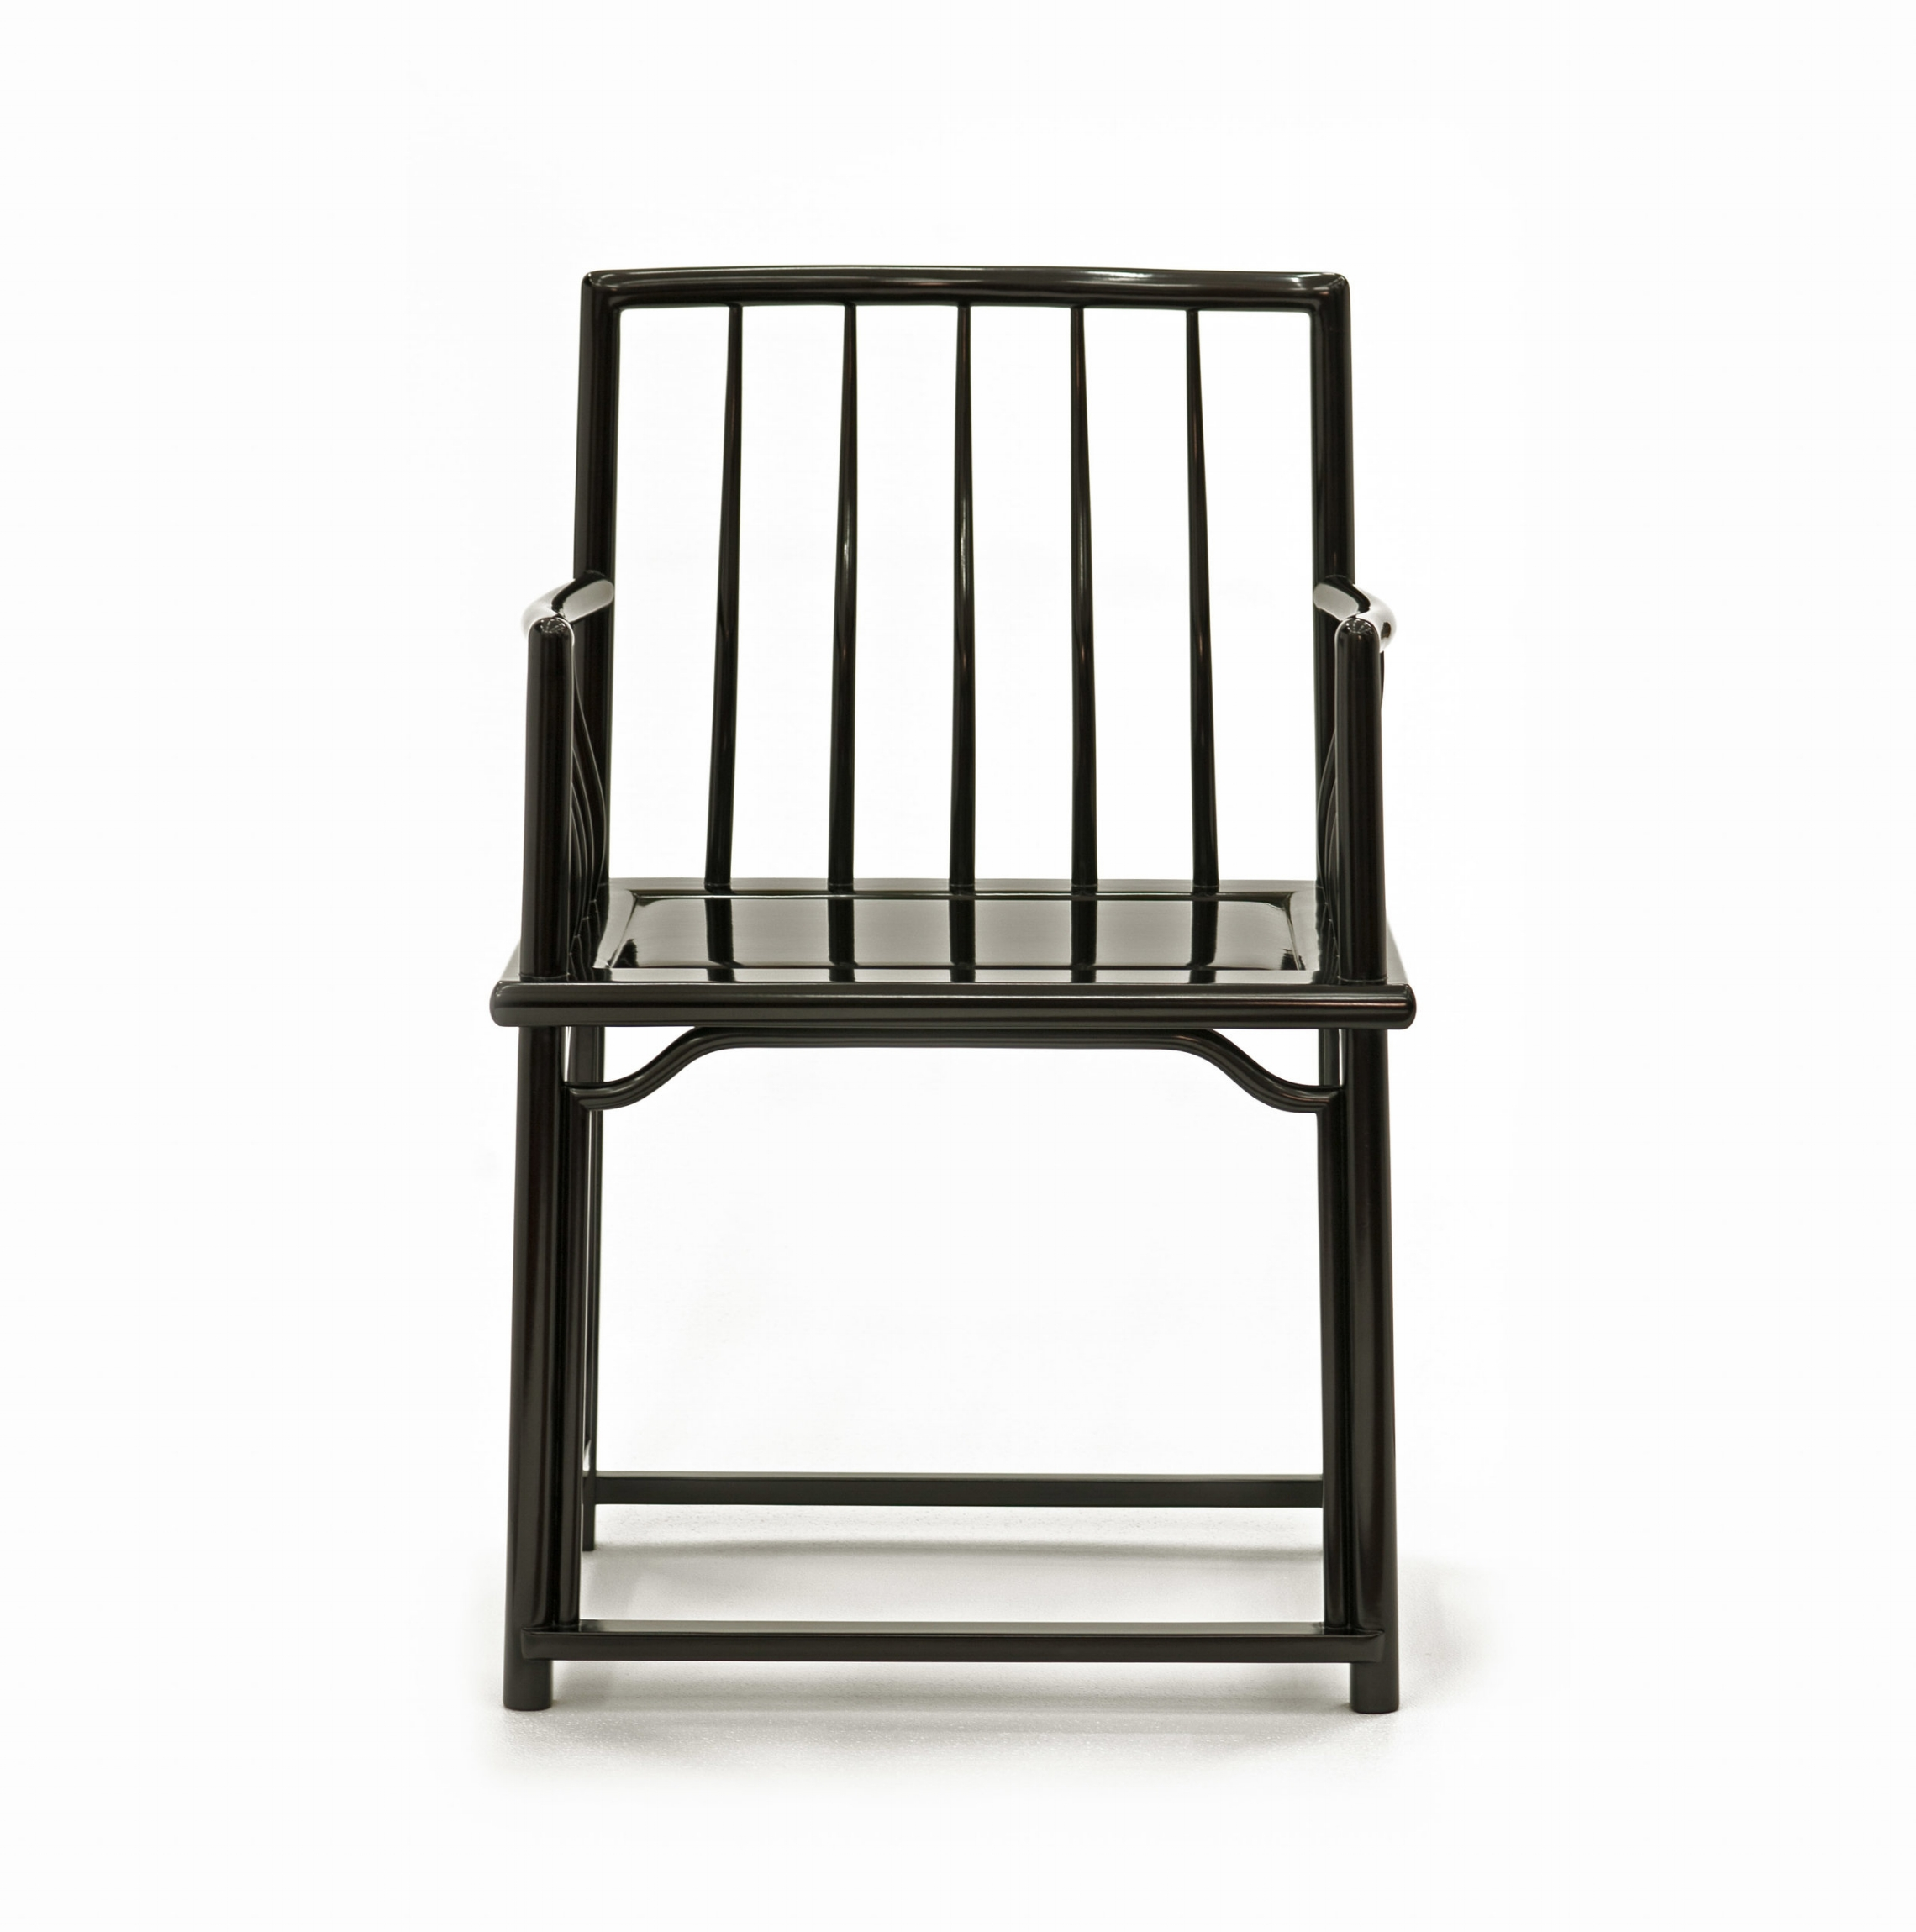 ....chinese ming style furniture | park hyatt washington : armchair..中式明式家具 | 华盛顿柏悦酒店 :扶手椅....